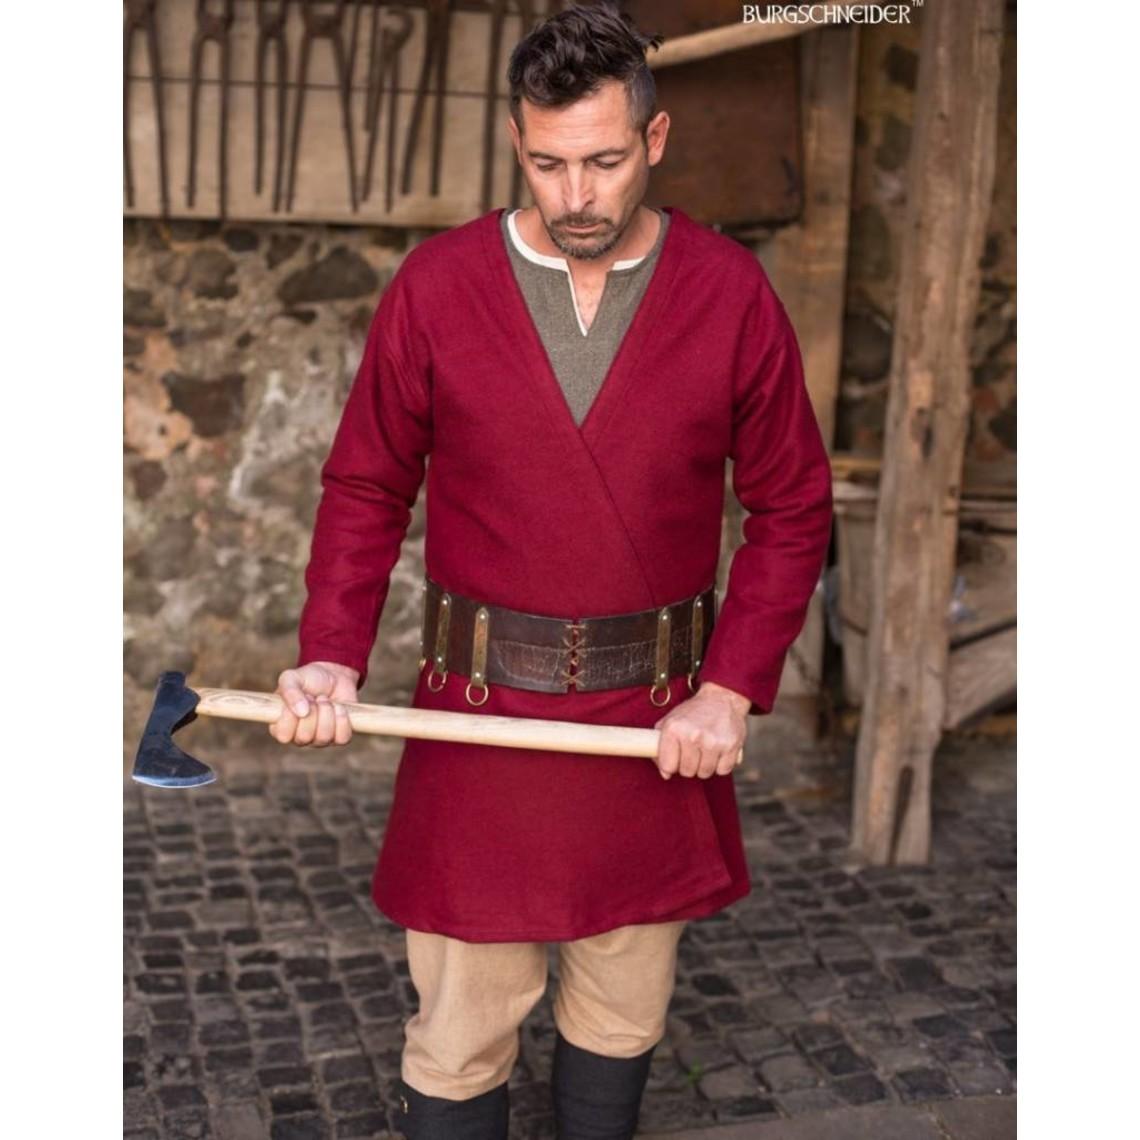 Burgschneider Vikingo caftán Loki (rojo)